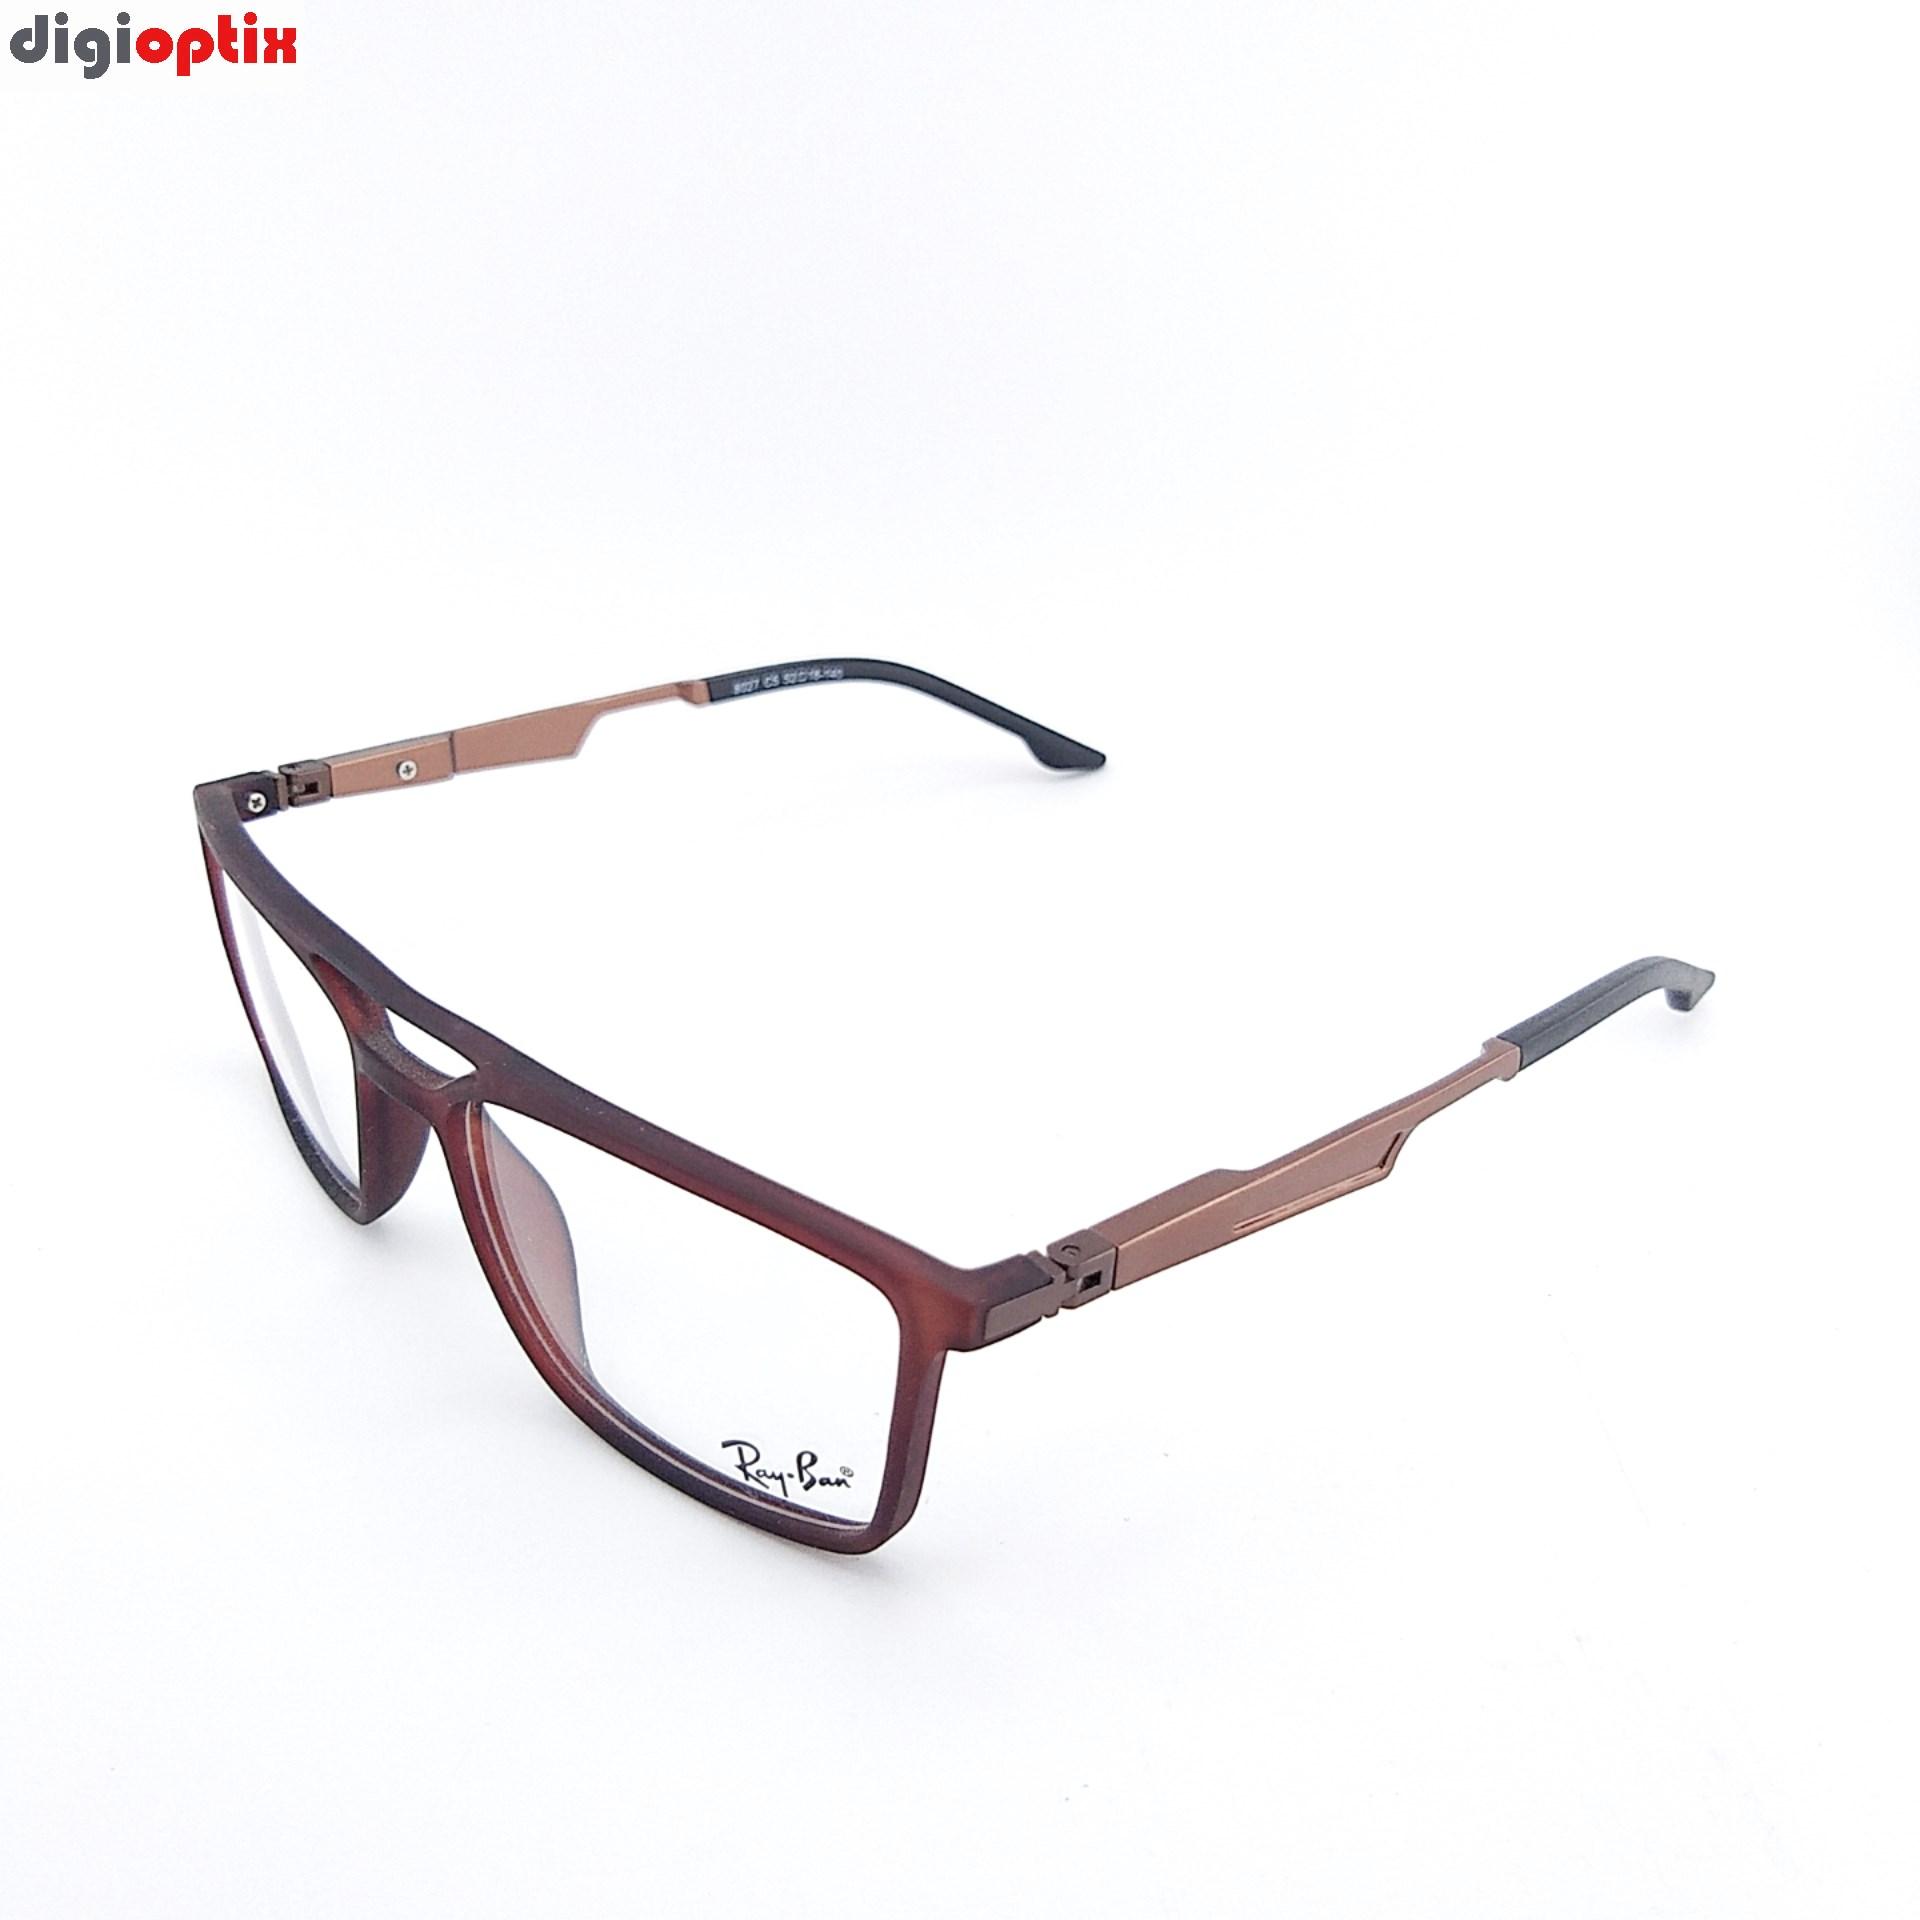 فریم عینک طبی طرح اسپورت ترکیبی مارک Ray-Ban مدل 8027